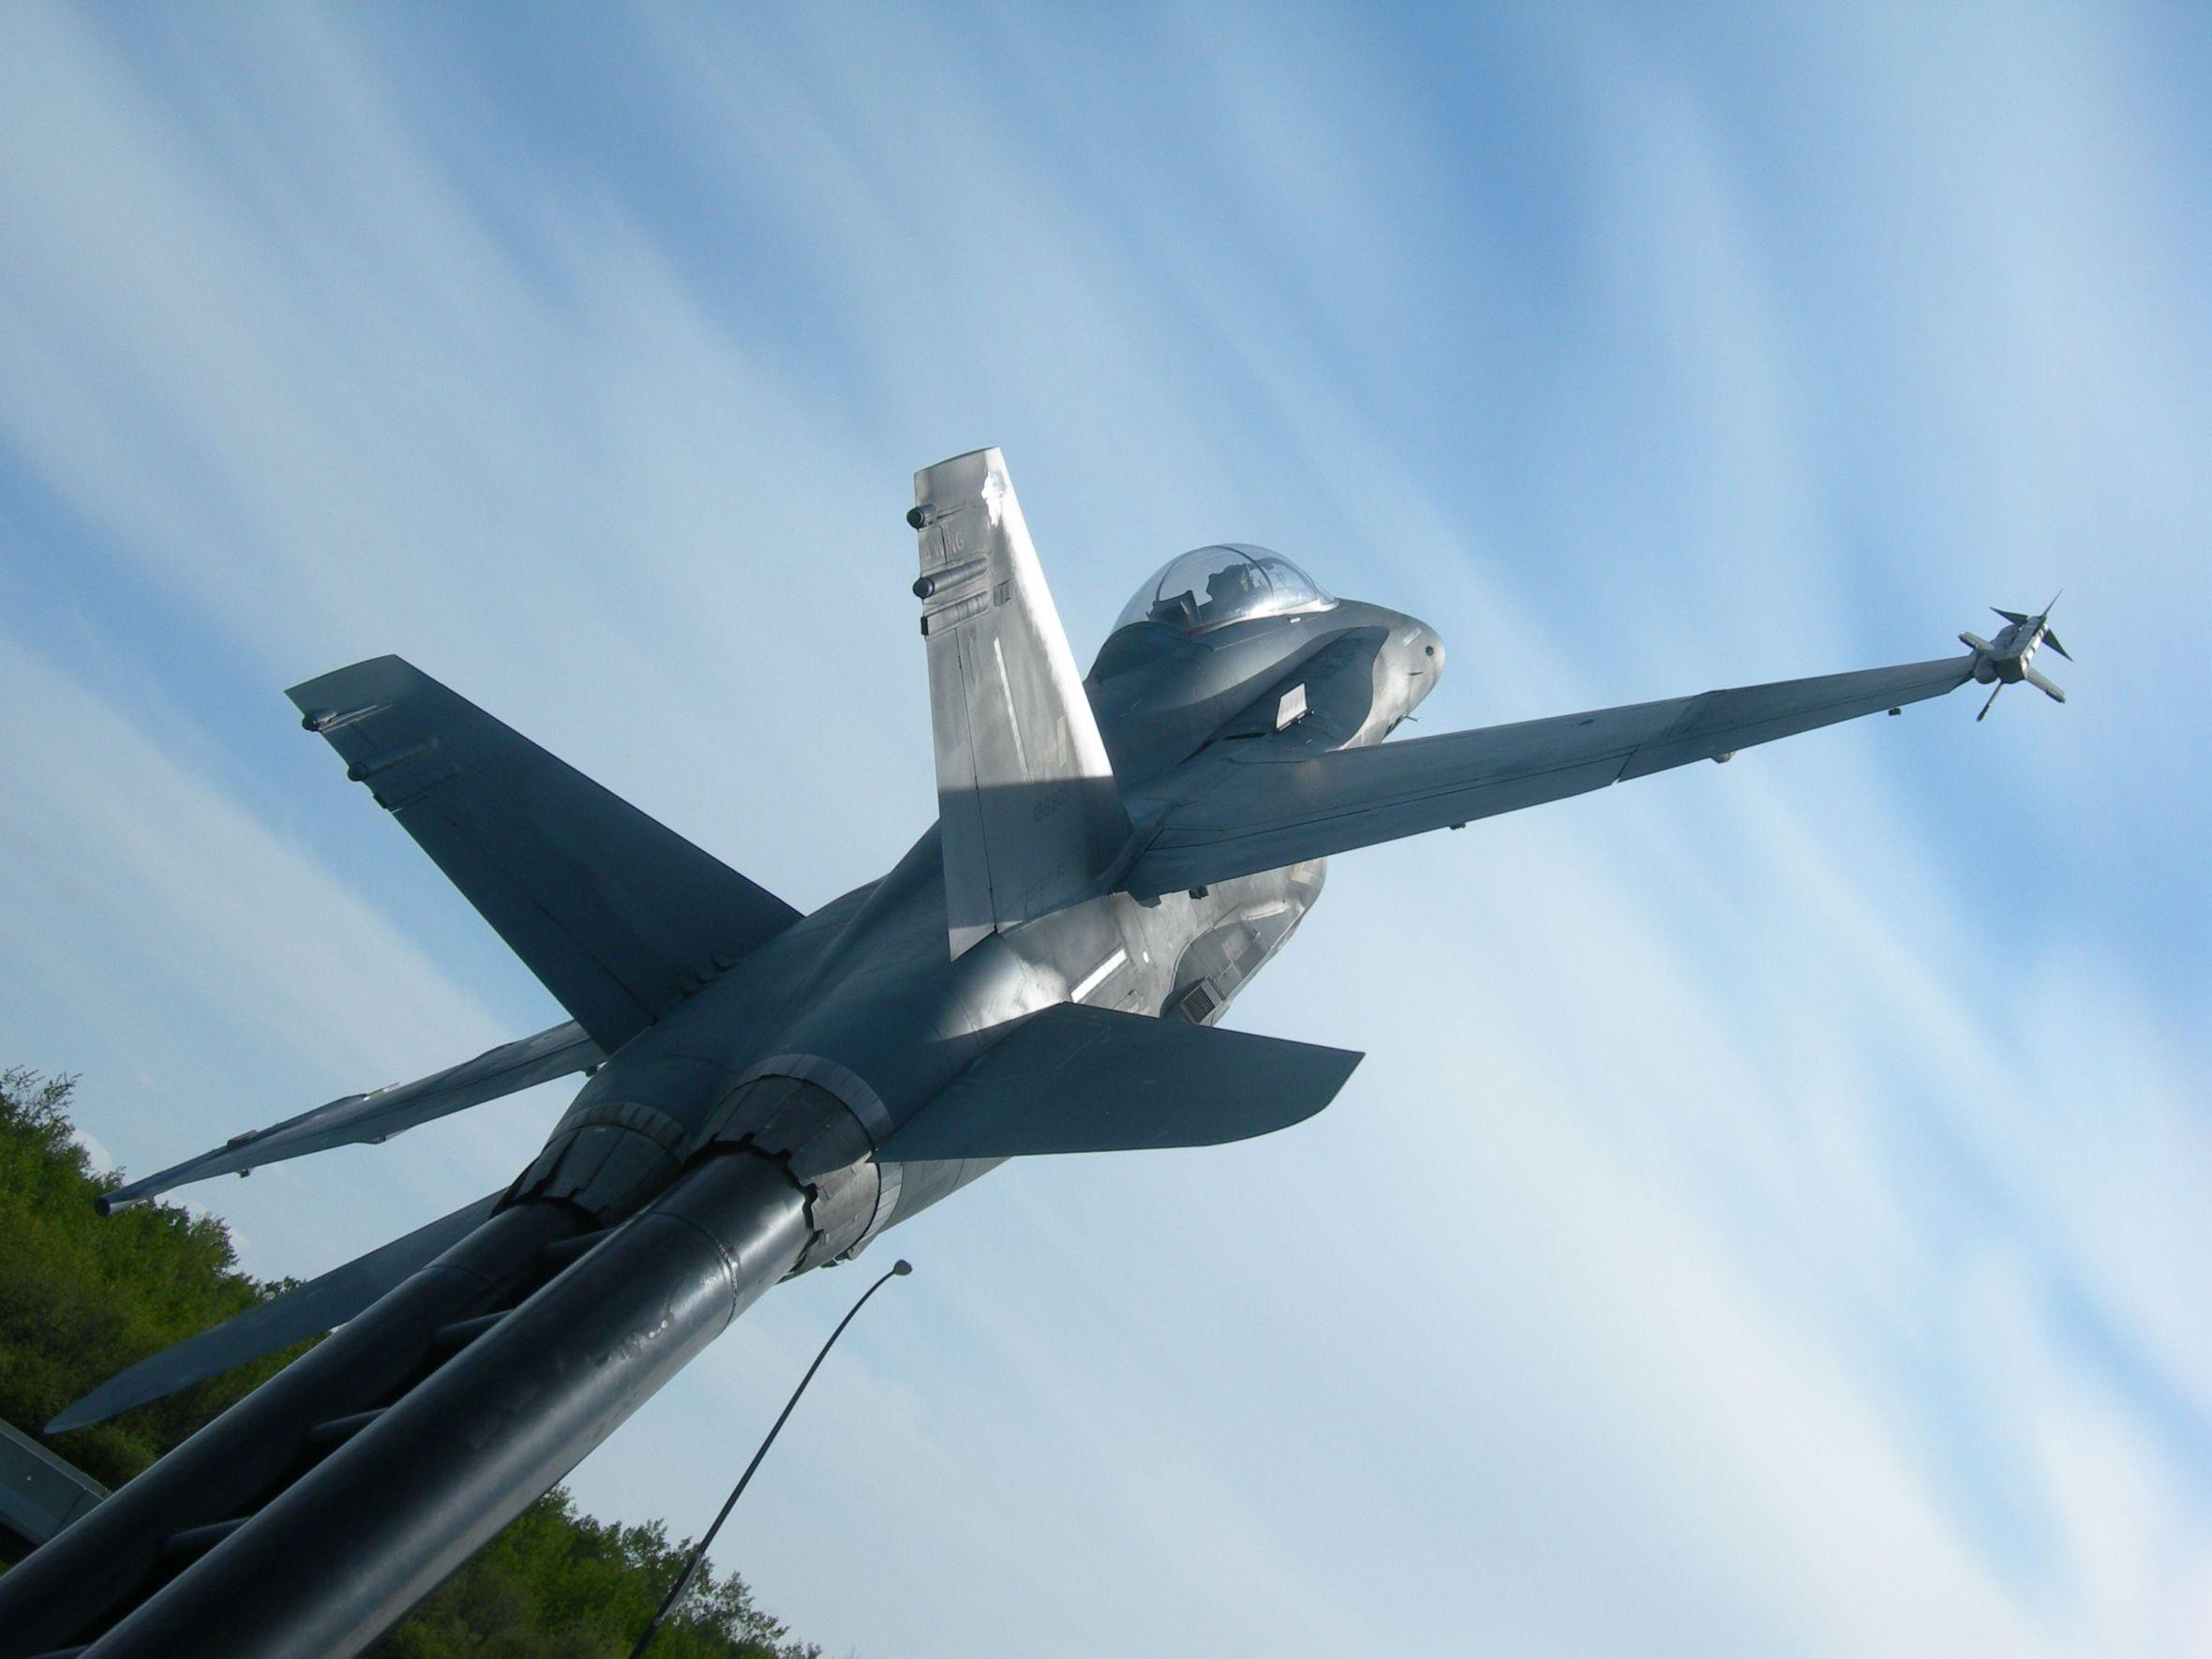 Stèles Base aérienne Cold Lake-Alberta-Canada 14060504283317629412292942